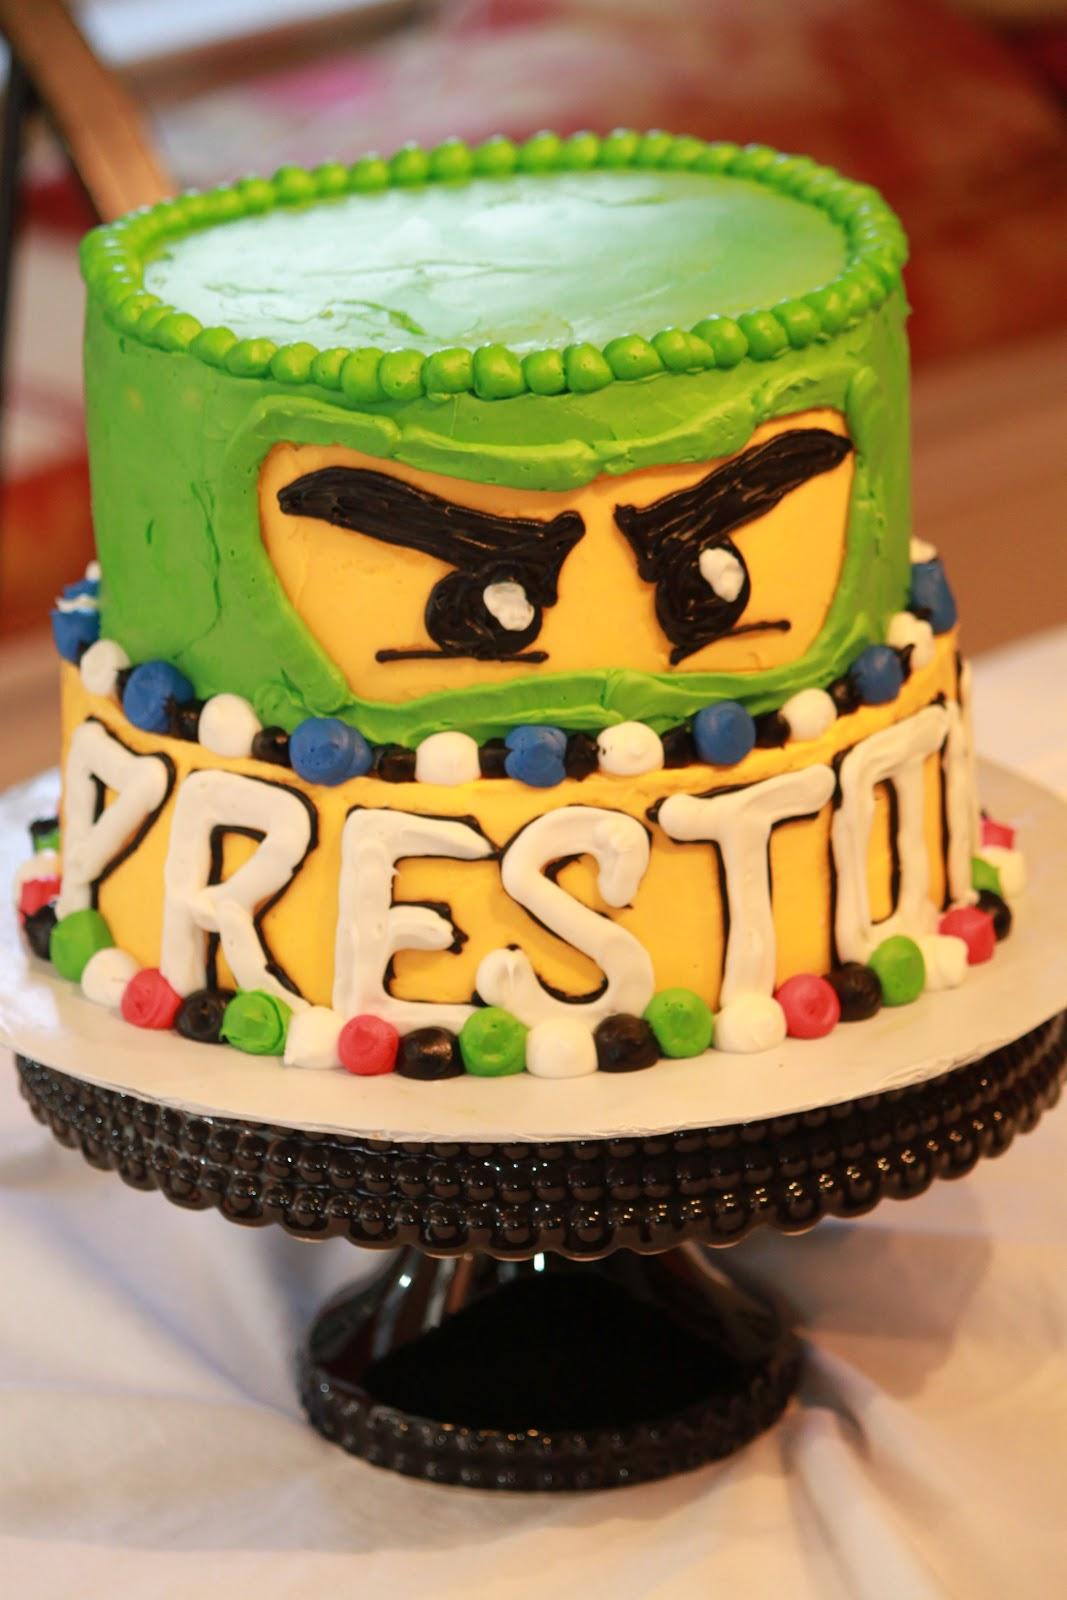 Ninja Leggo Birthday Cake Related Keywords & Suggestions